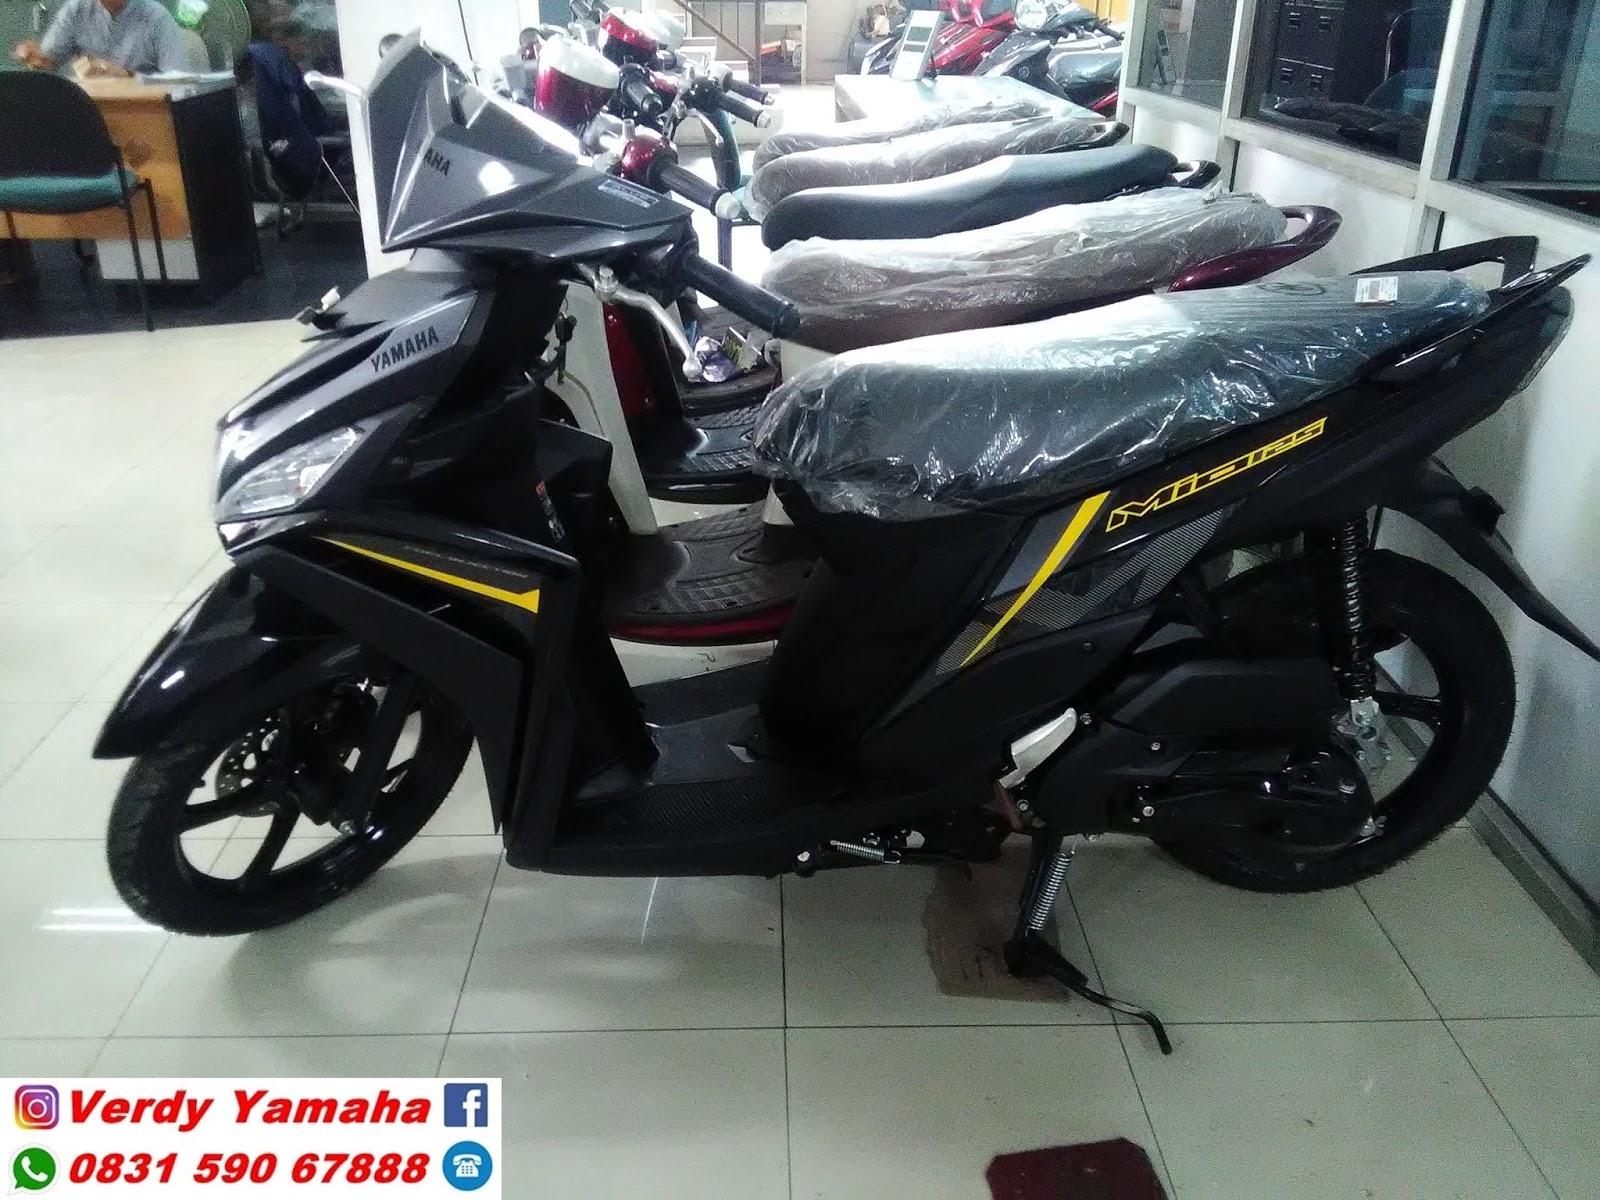 Promo Gebyar Yamaha Banjarmasin Dealer Paling Murah Dan New Vario 110 Esp Cbs Iss Grande White Kab Semarang September Ceria